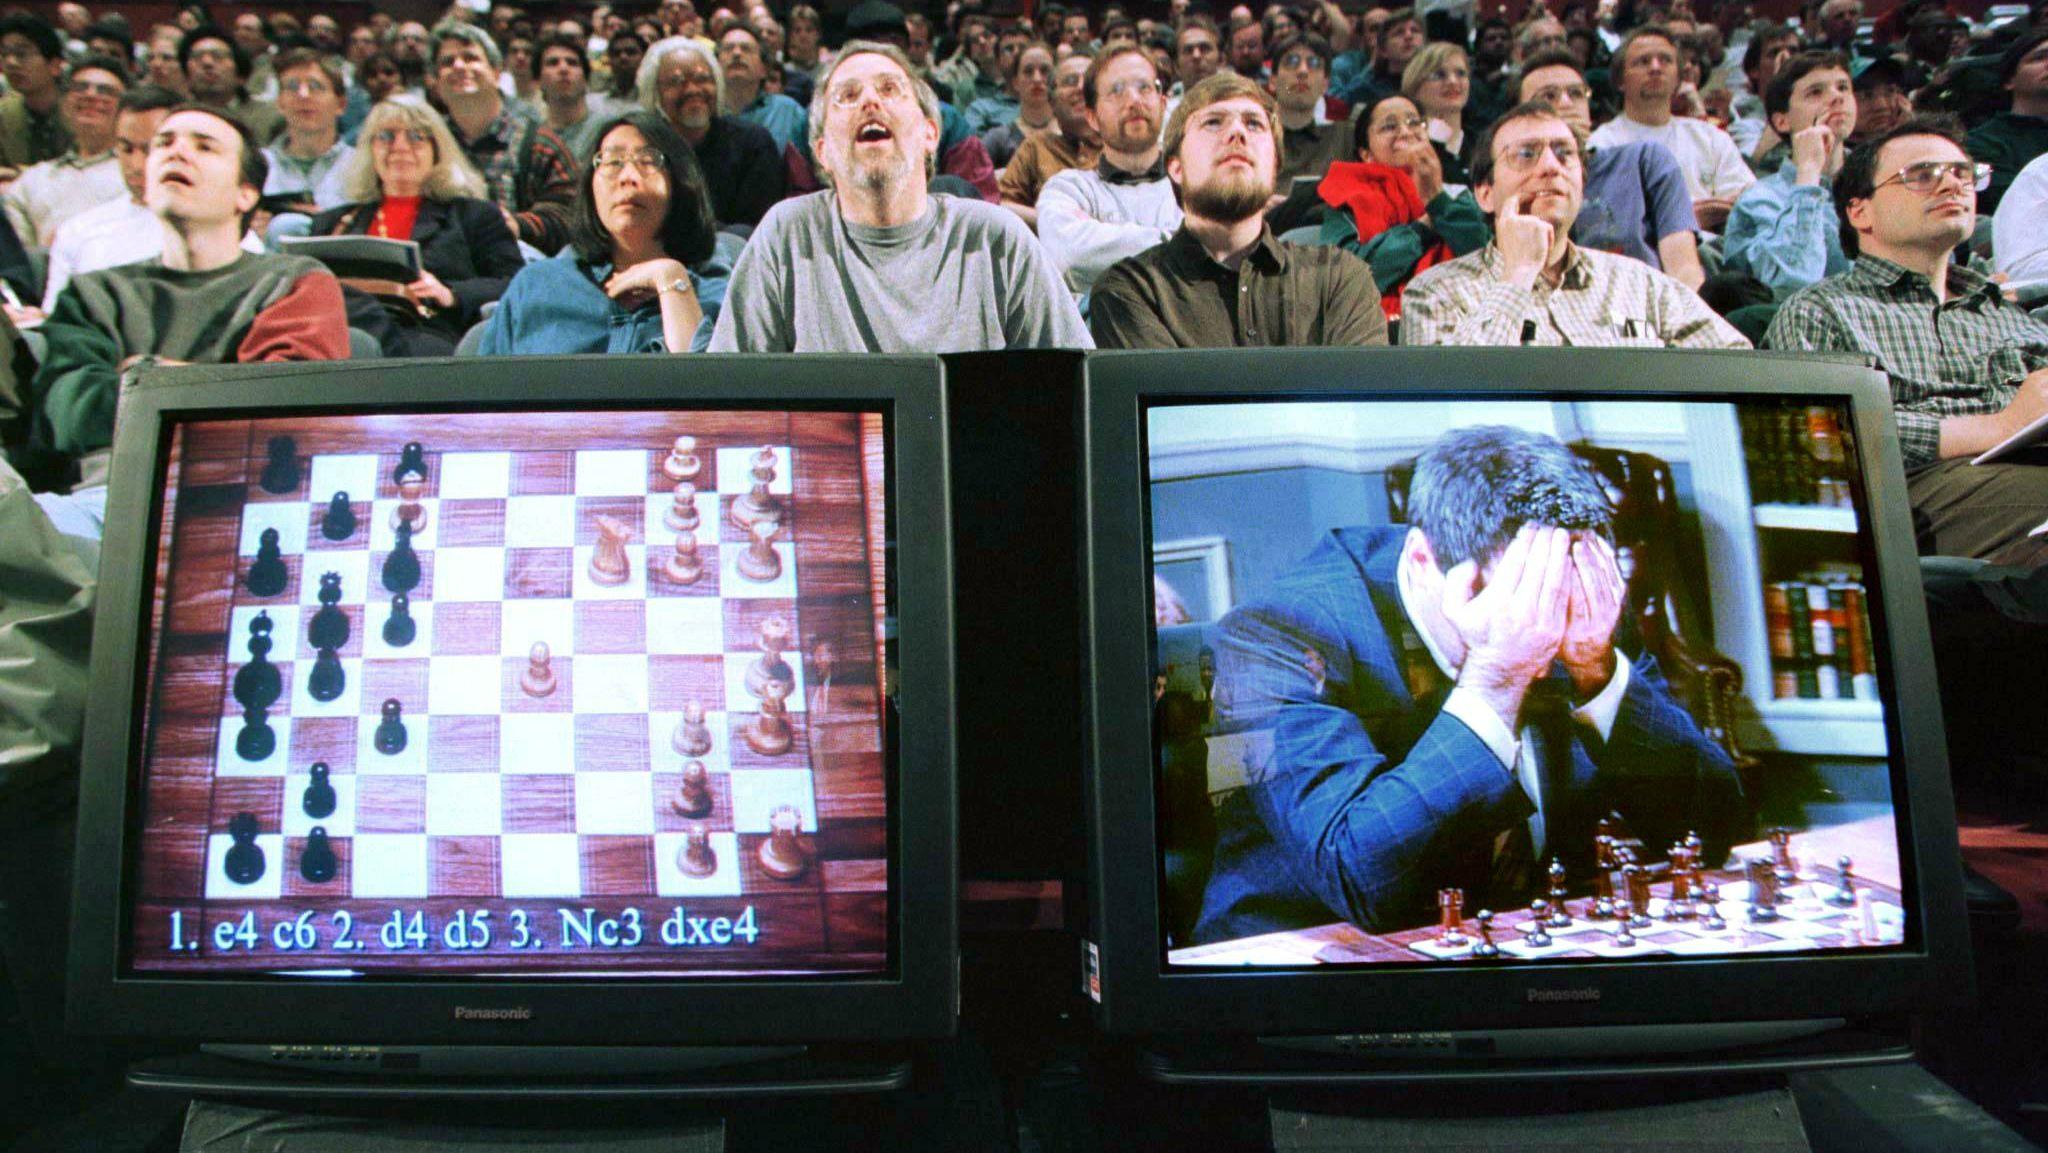 Gary Kasparov during a match against Deep Blue.